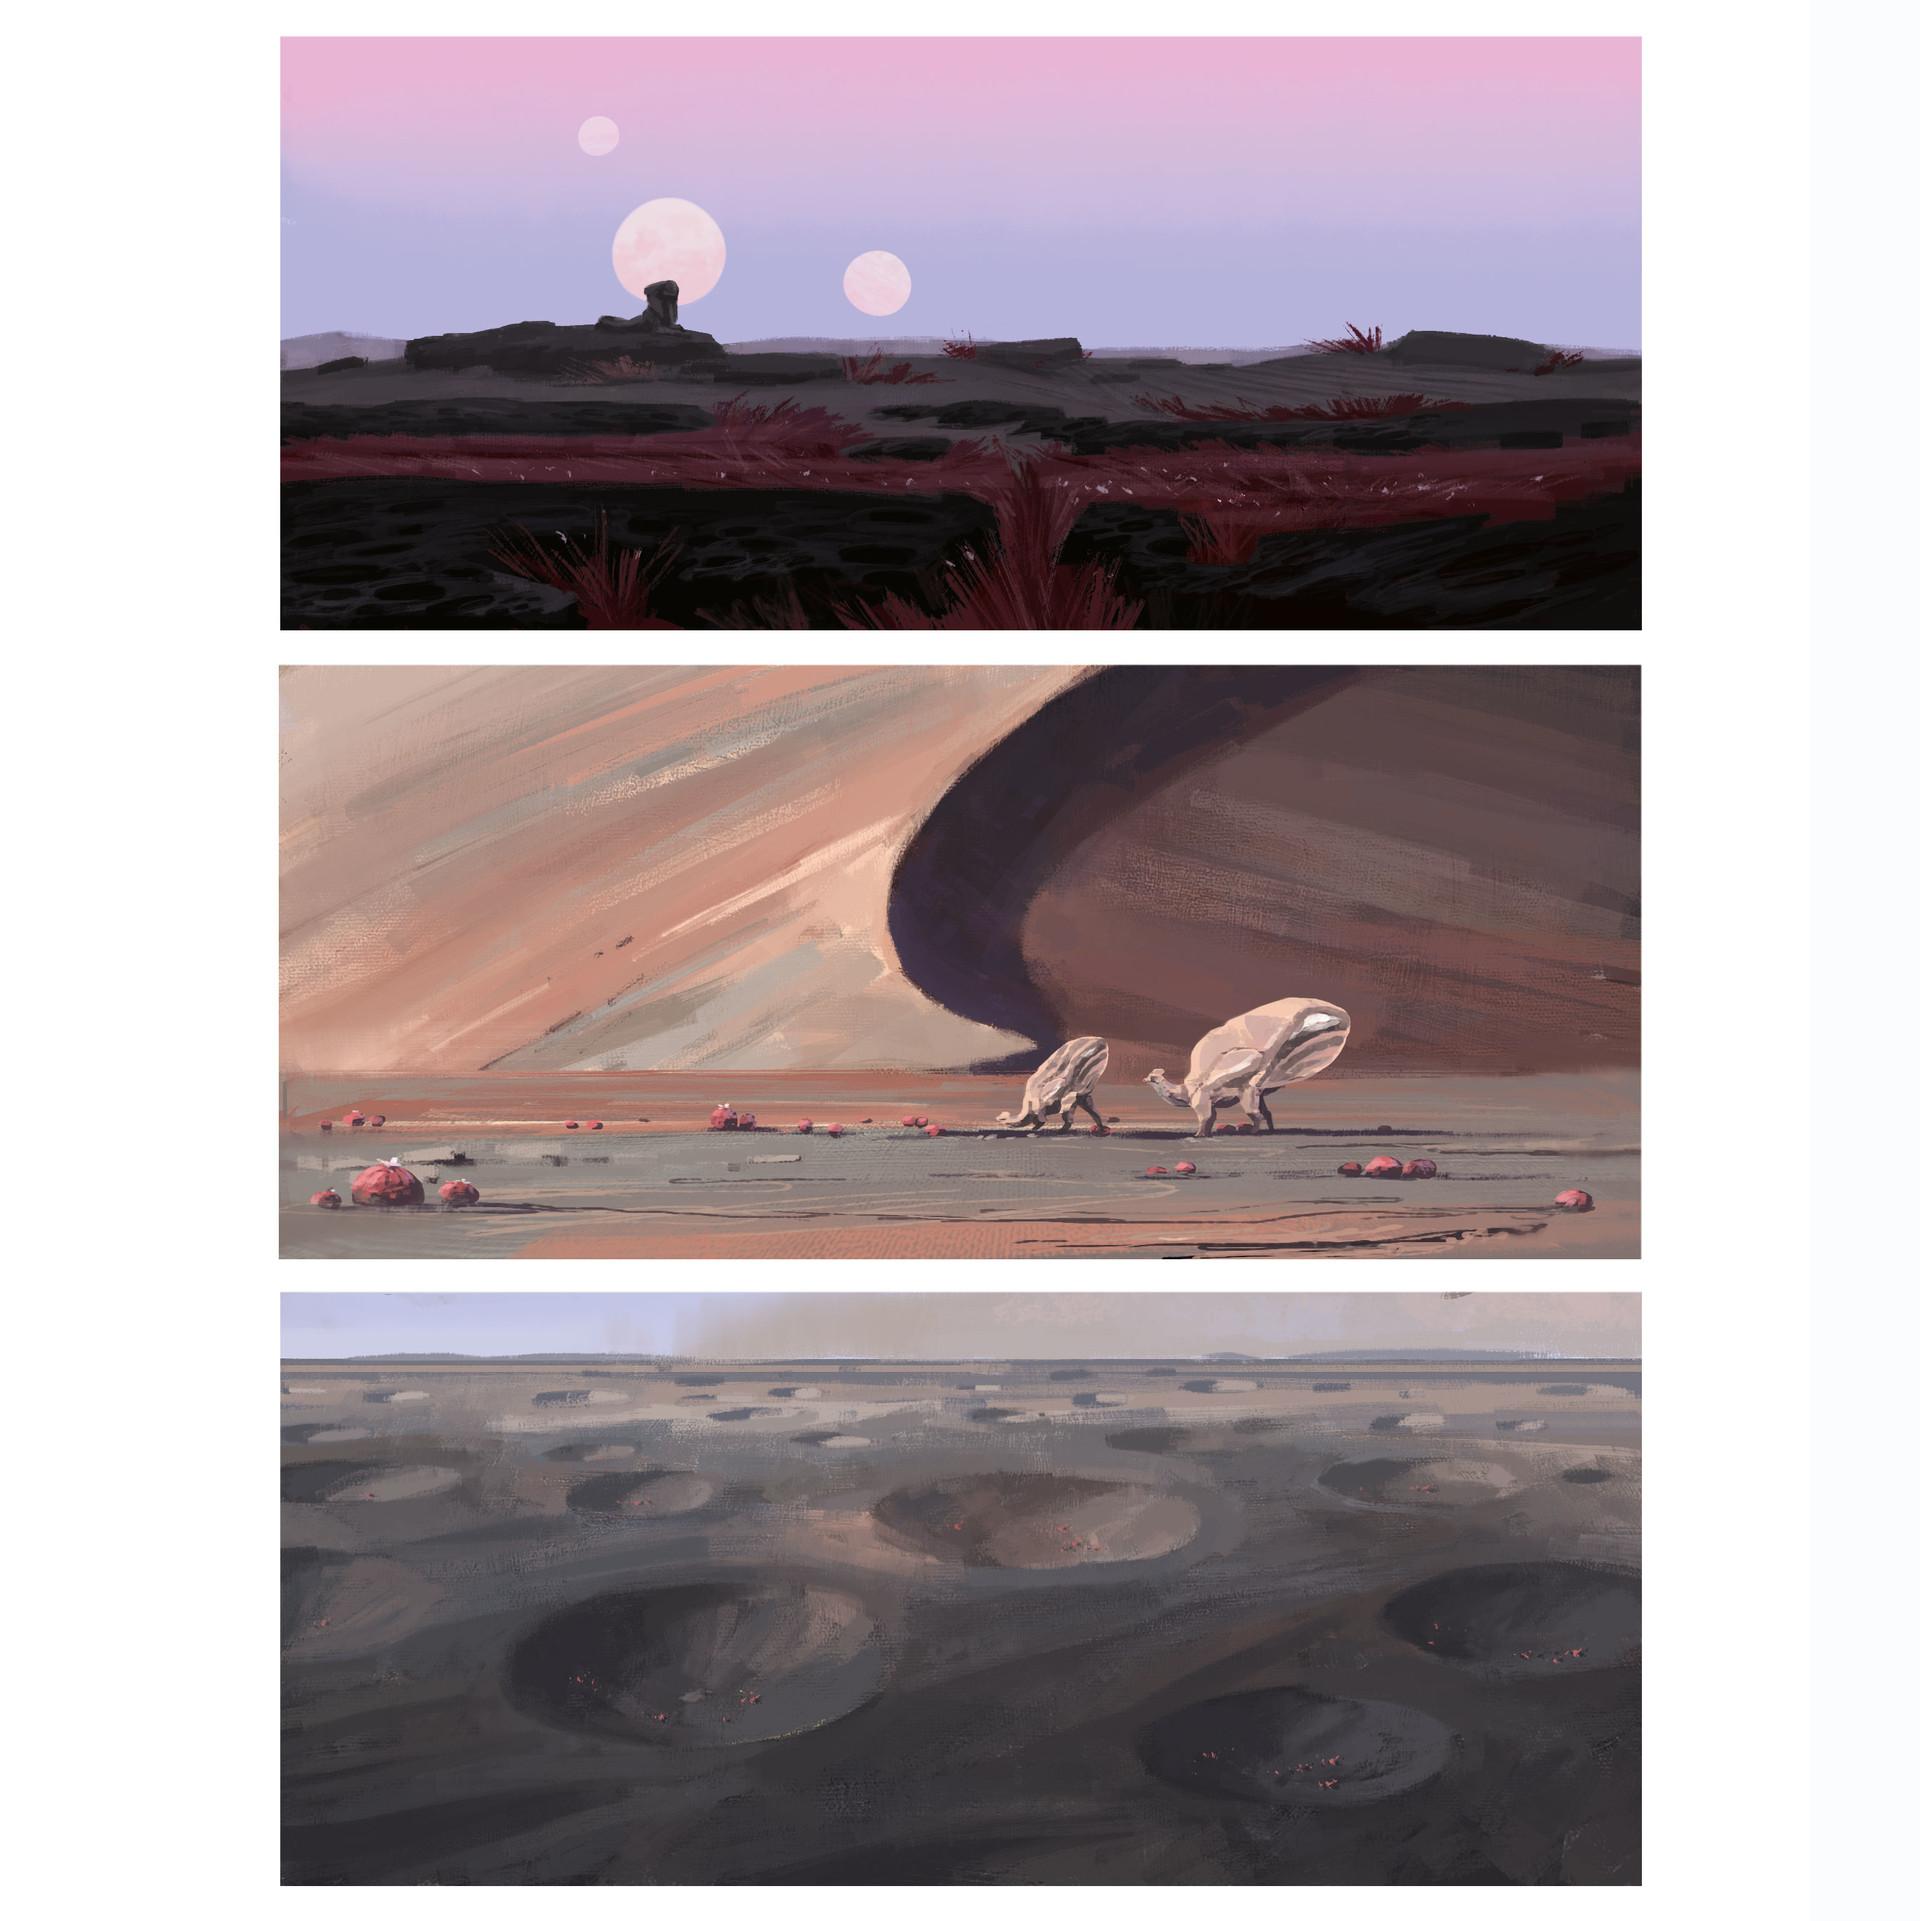 [Reflexion] Les oeuvres qui vous inspirent Alexander-ostrowski-05-desert-colorroughs-insta1